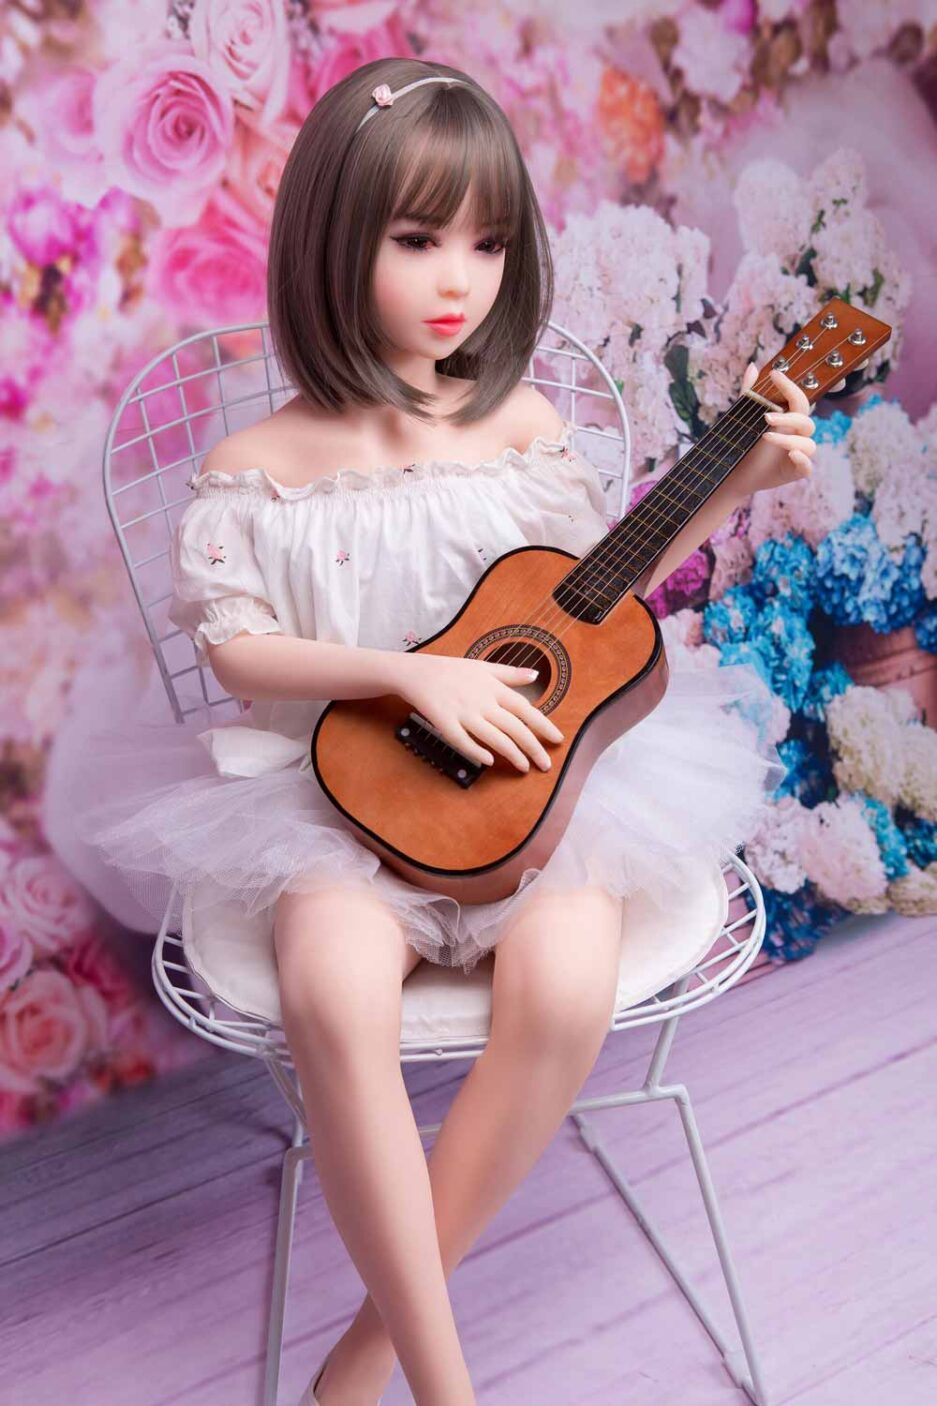 Mini sex doll sitting on a chair